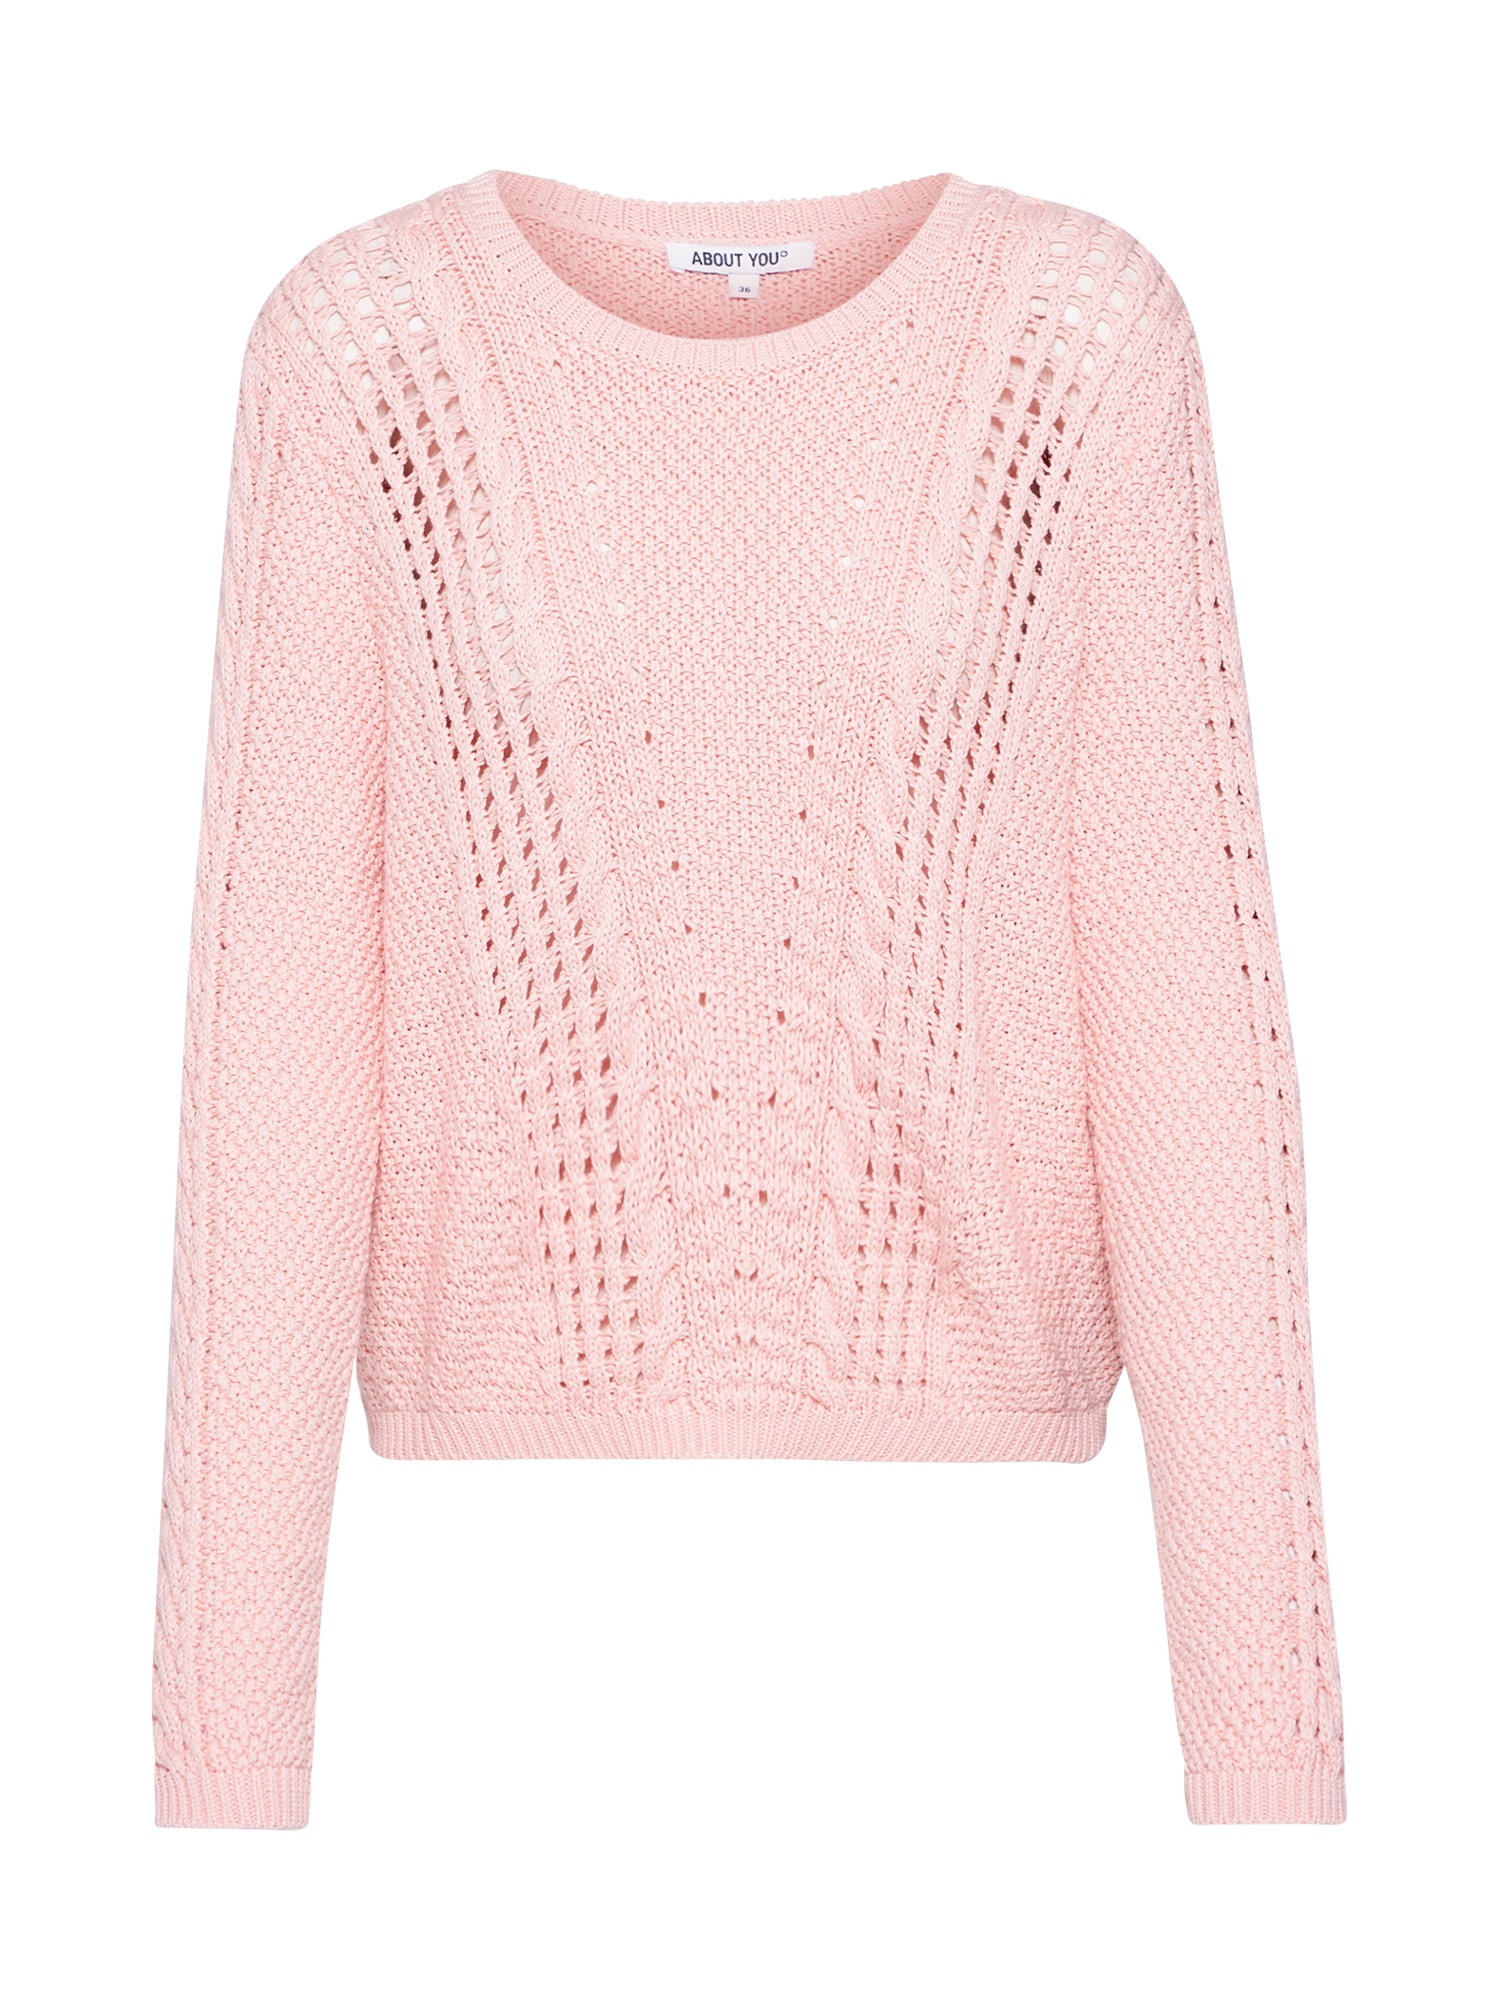 ABOUT YOU Megztinis 'Nala' rožių spalva